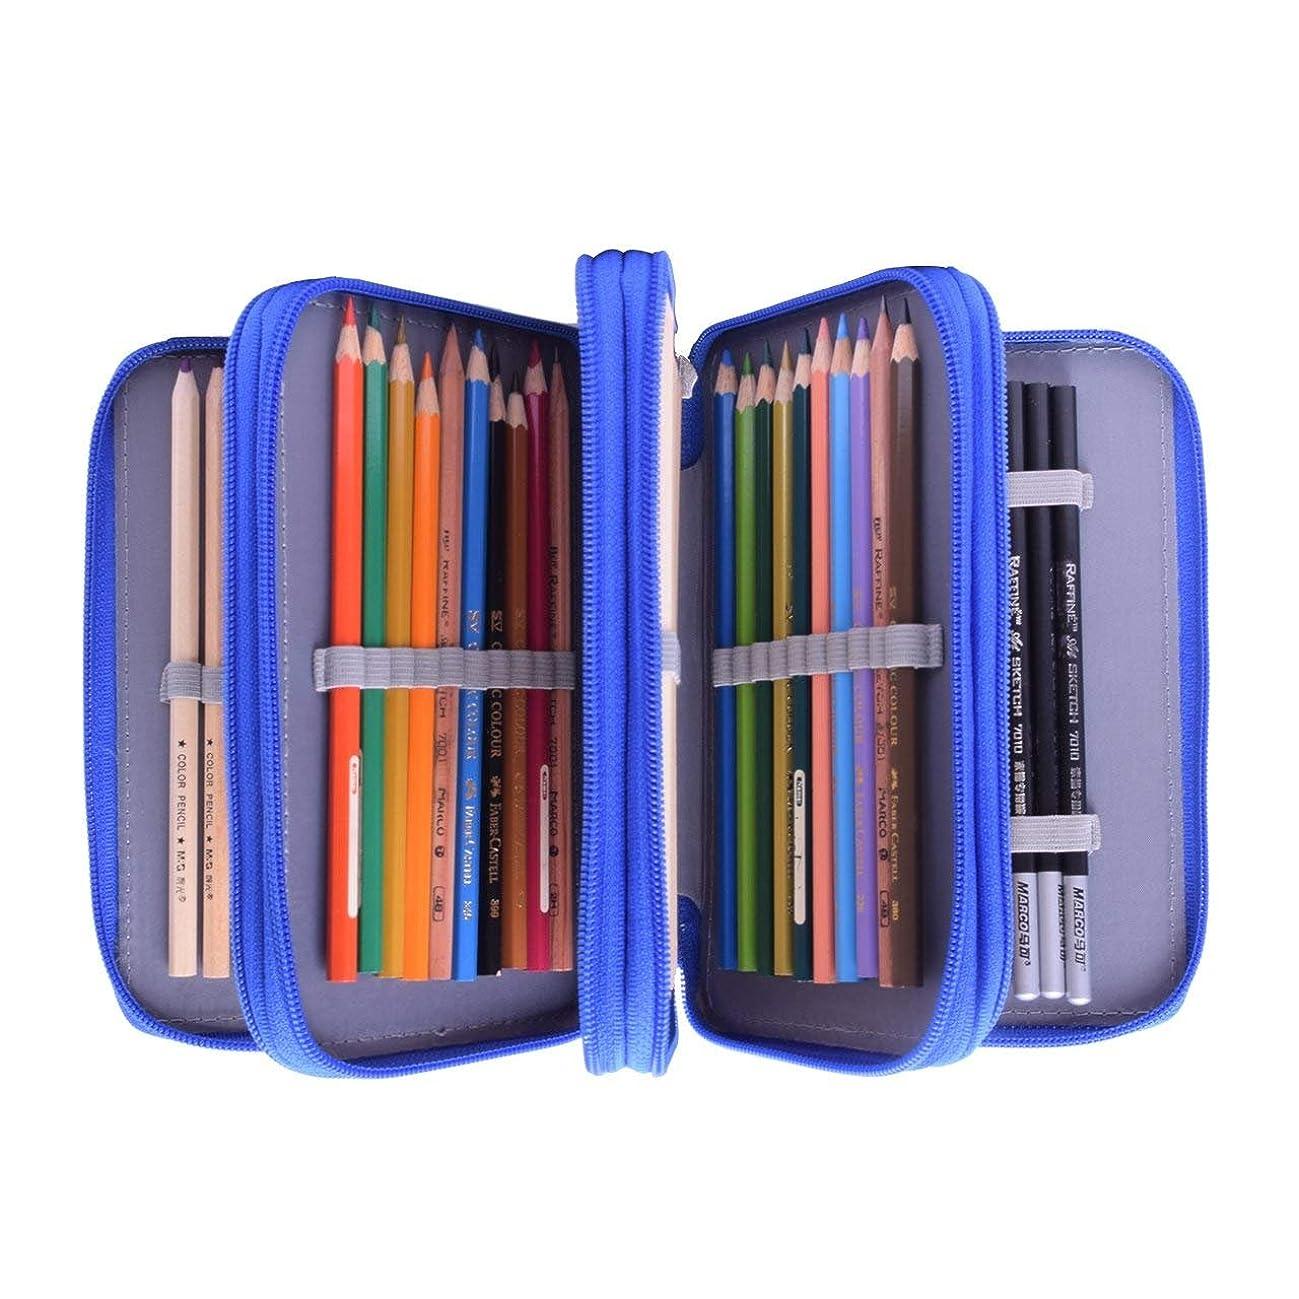 72 Slot Pencil Case Large Capacity 4-Layer Colored Pencil Holder Artist Students Pencil Case Pen Bag Pouch Portable Zipper Pencil Coloring Pencils Organizer Stationary Box Makeup Cosmetic Case Bag